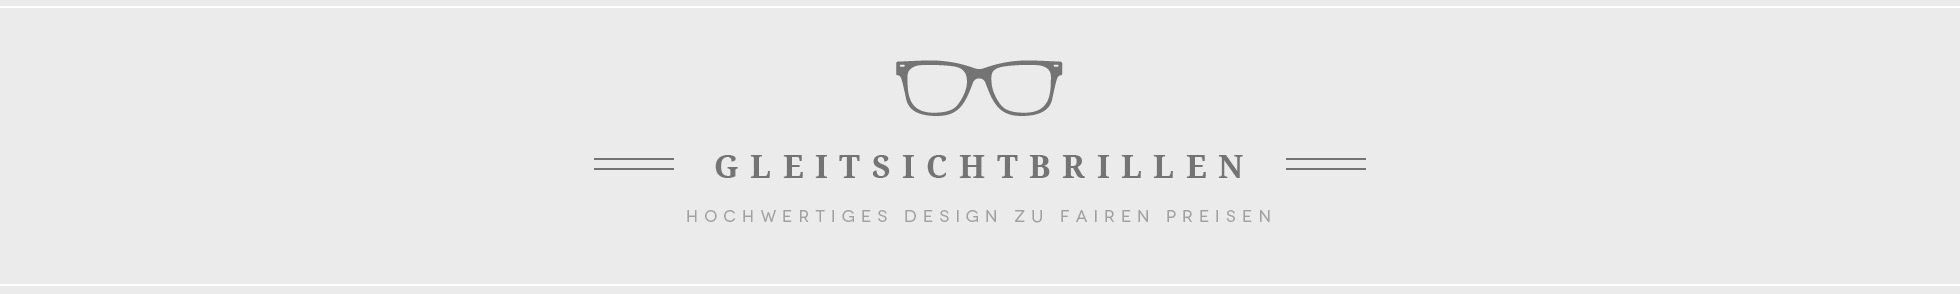 Designerbrillen | ab 239€